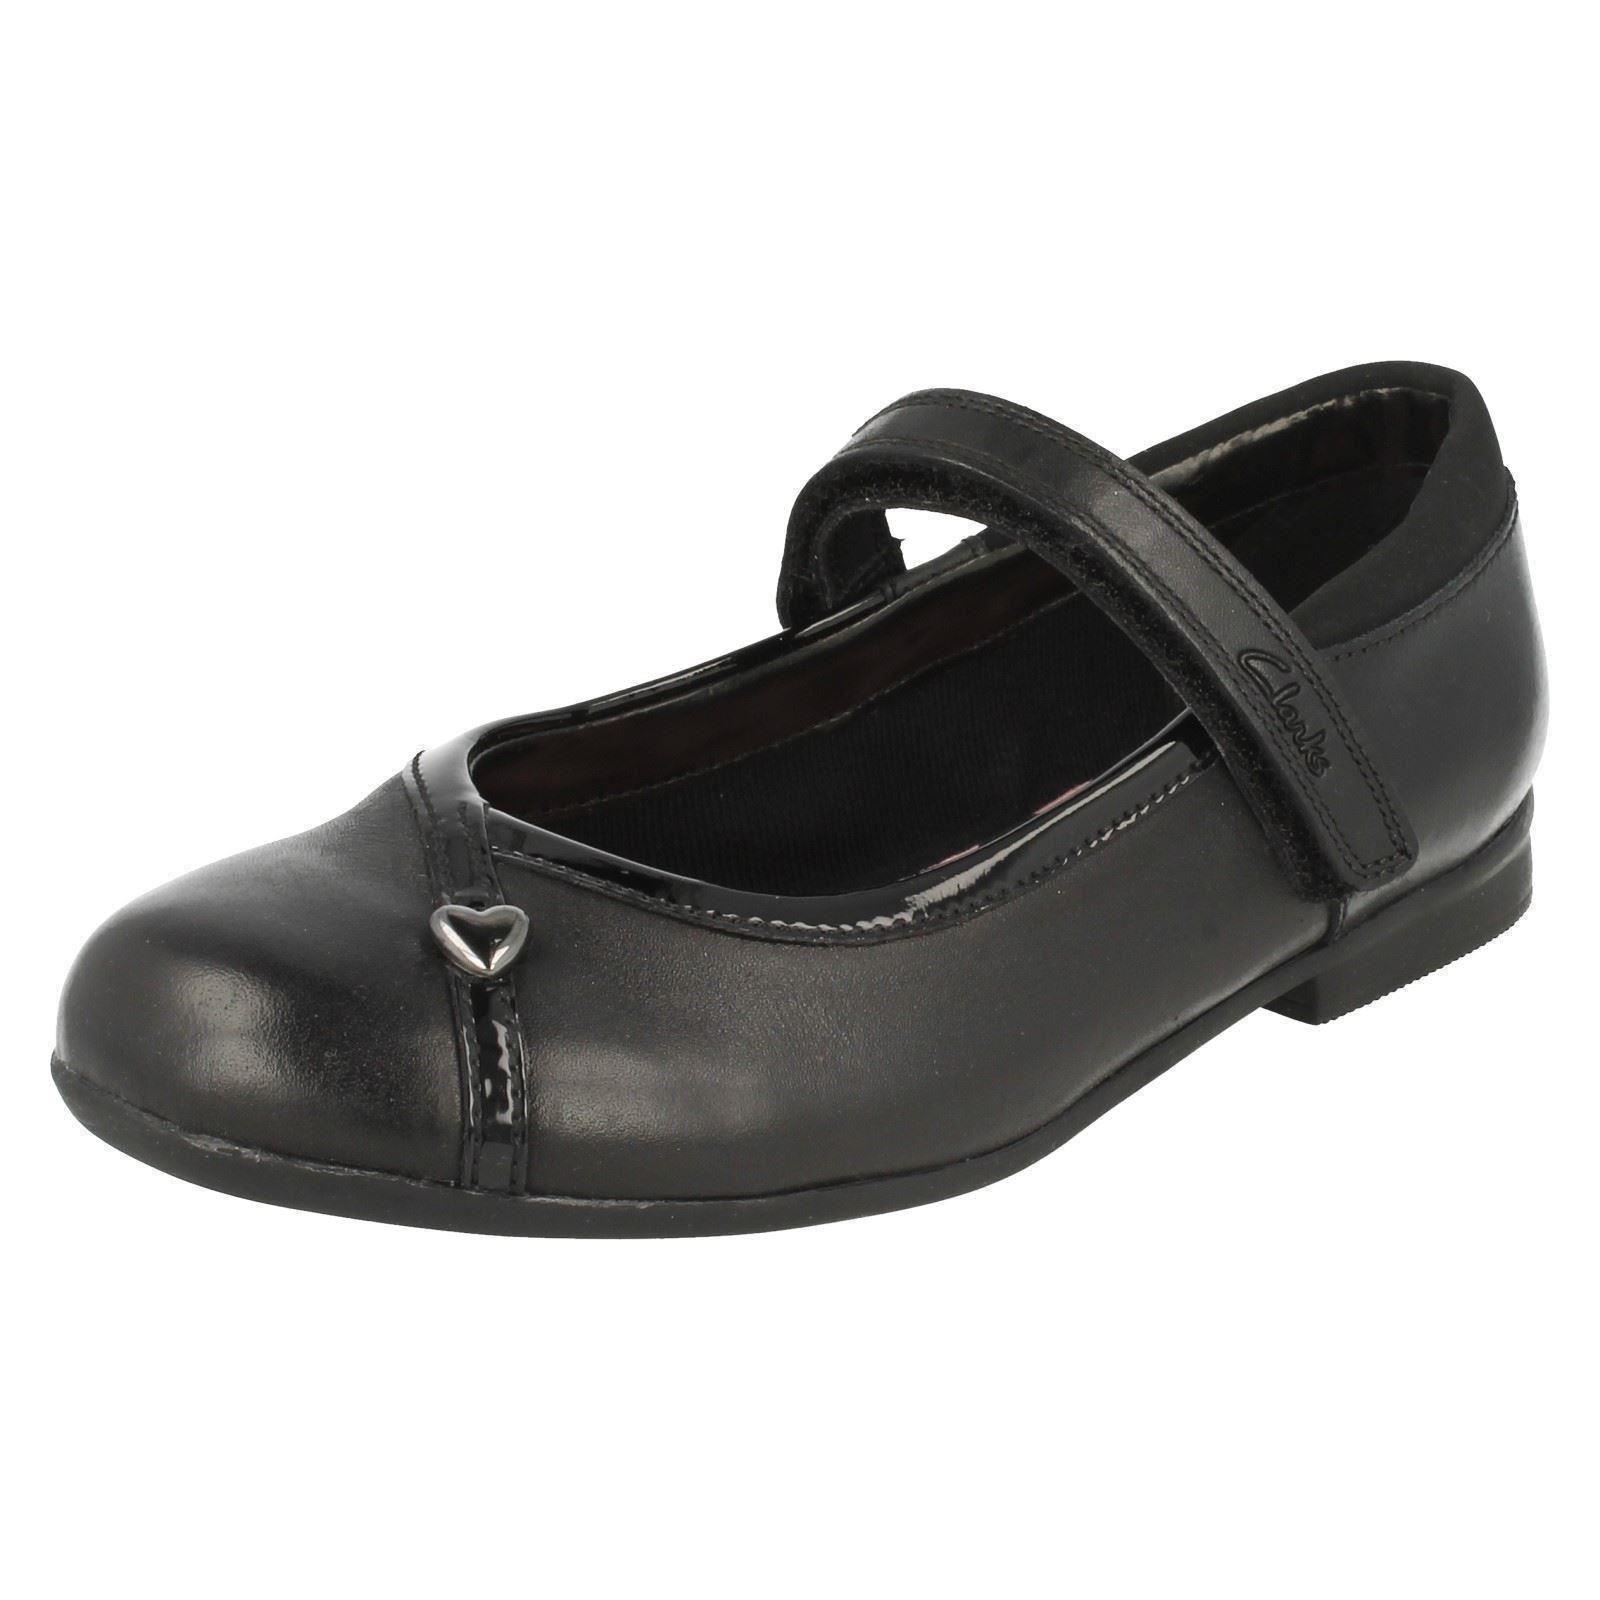 Girls Clarks Formal School Shoes Dolly Babe UK 10 Infant Black